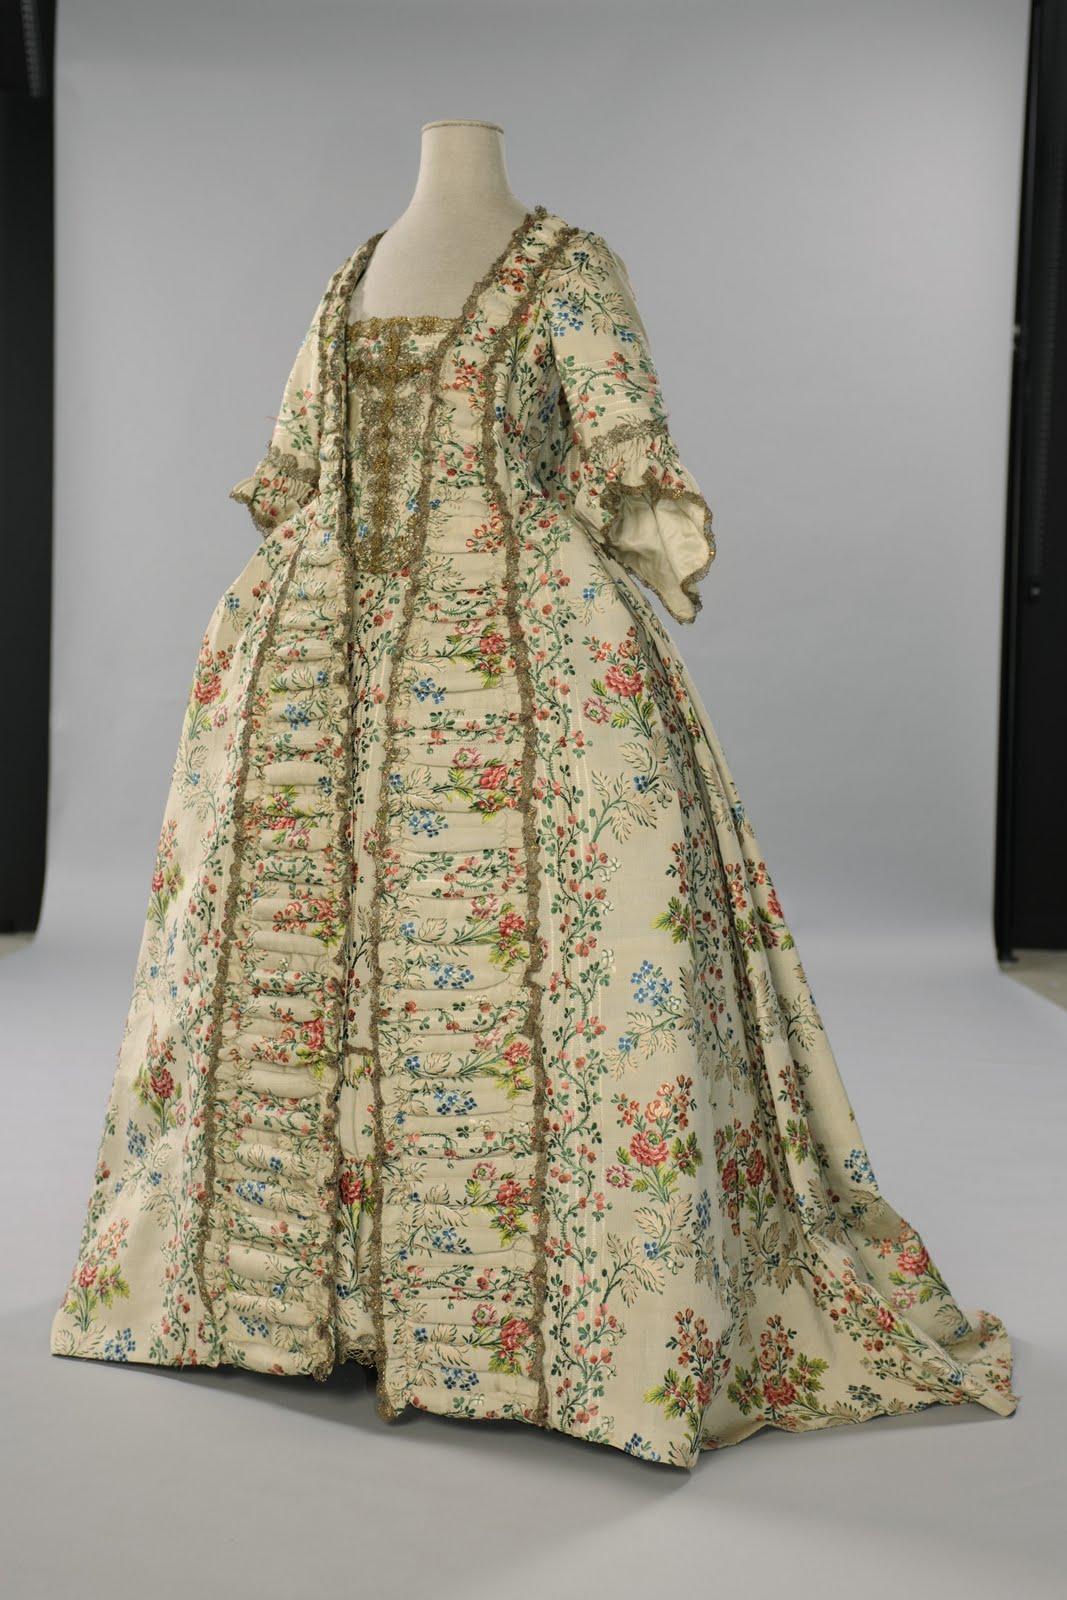 Marie Antoinette Meets Vivienne Westwood The 18th Century